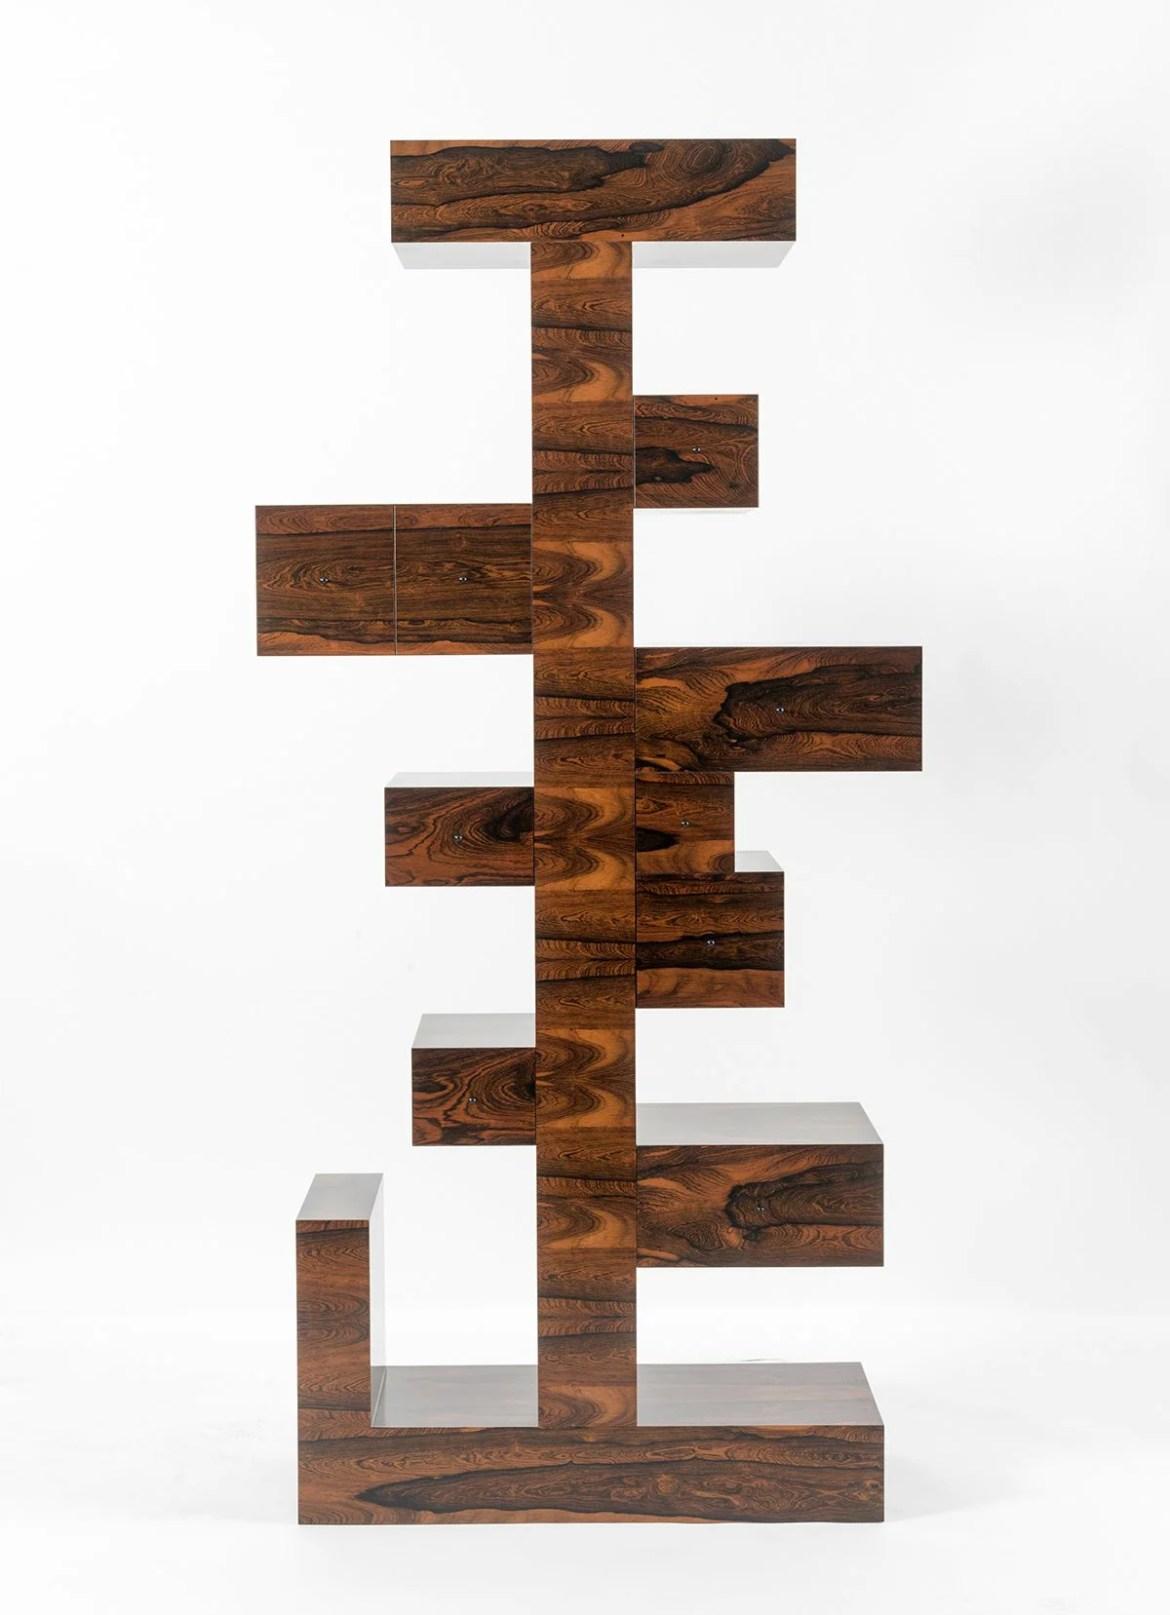 DesignMiami/ Basel 2017, Friedman Benda, Ettore Sottsass, Cabinet n°81